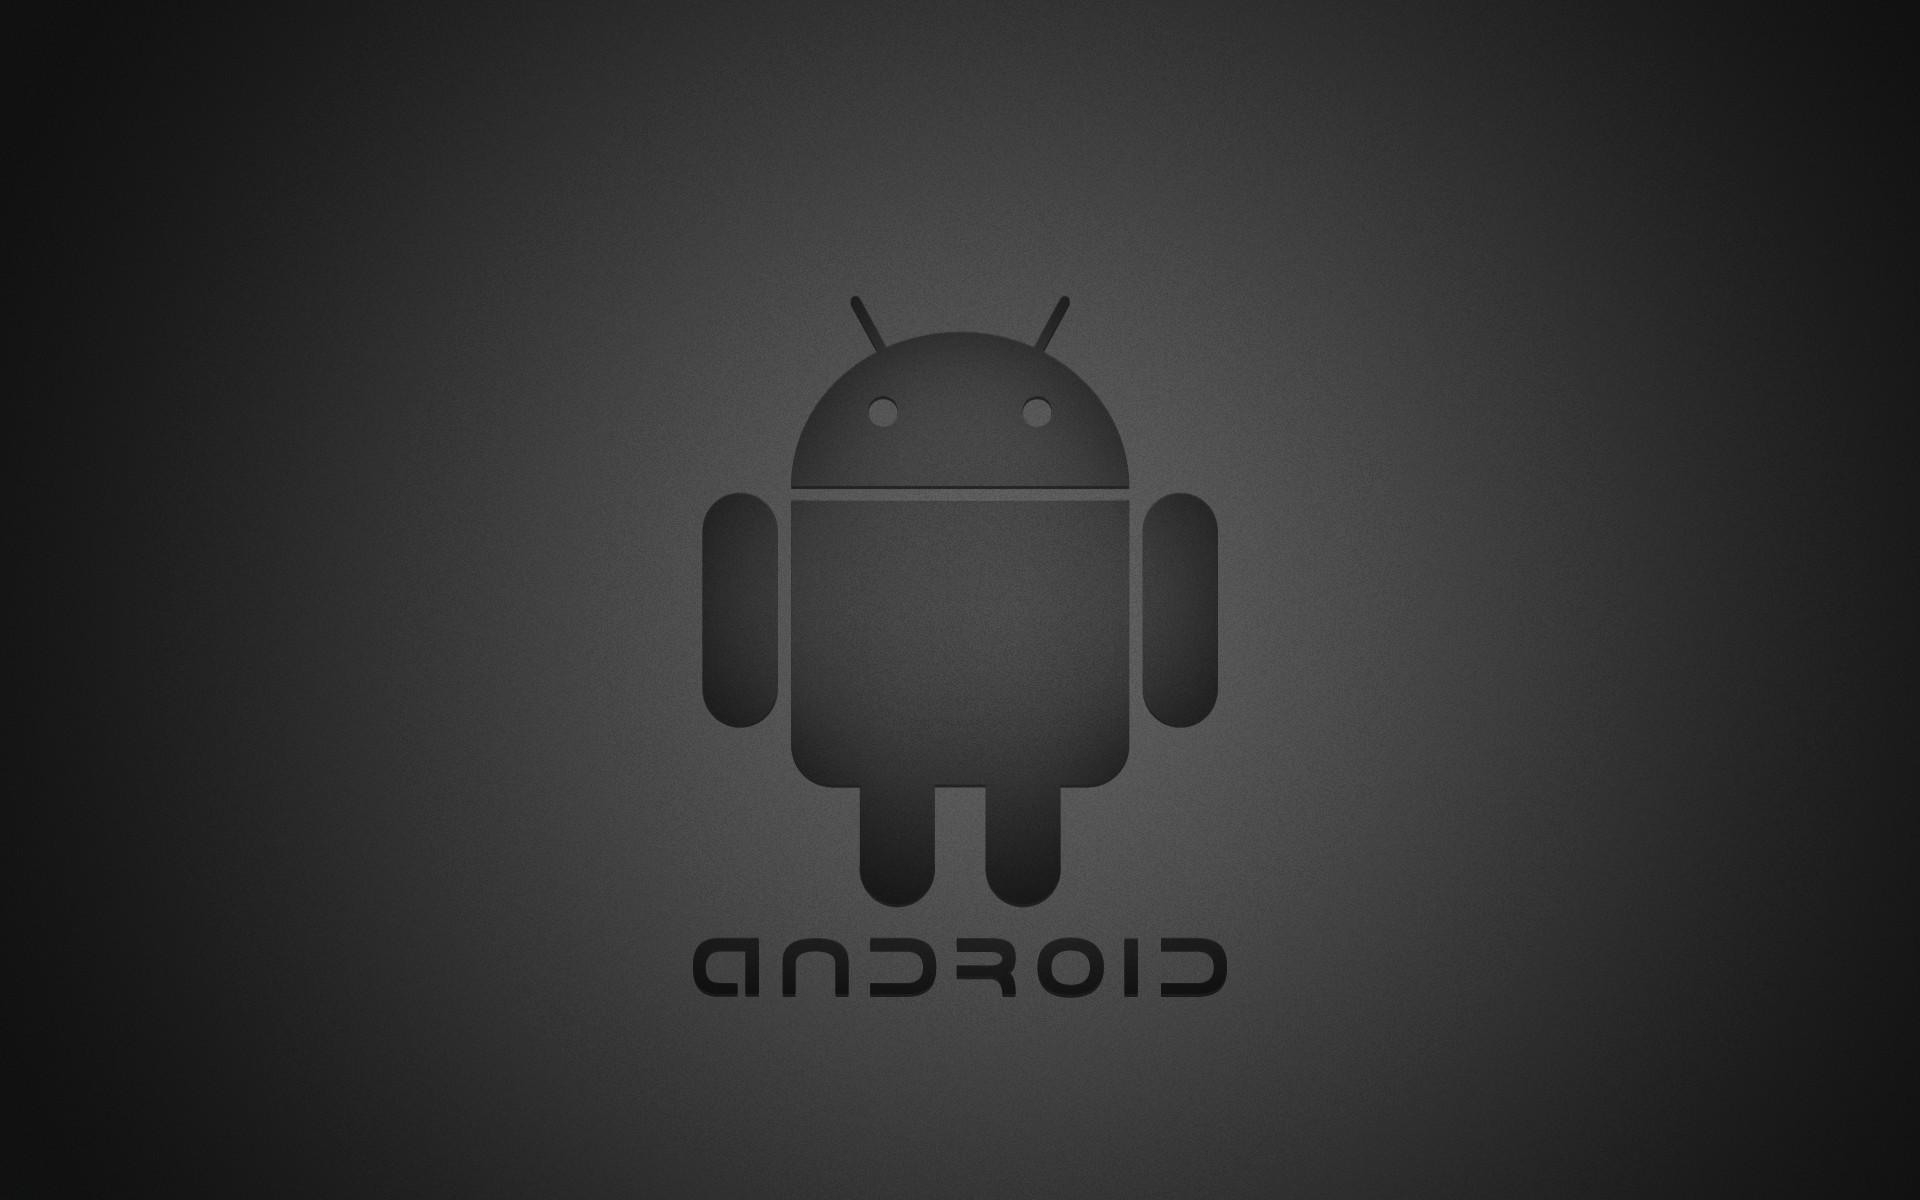 … tablet wallpapers android pixelstalk net …